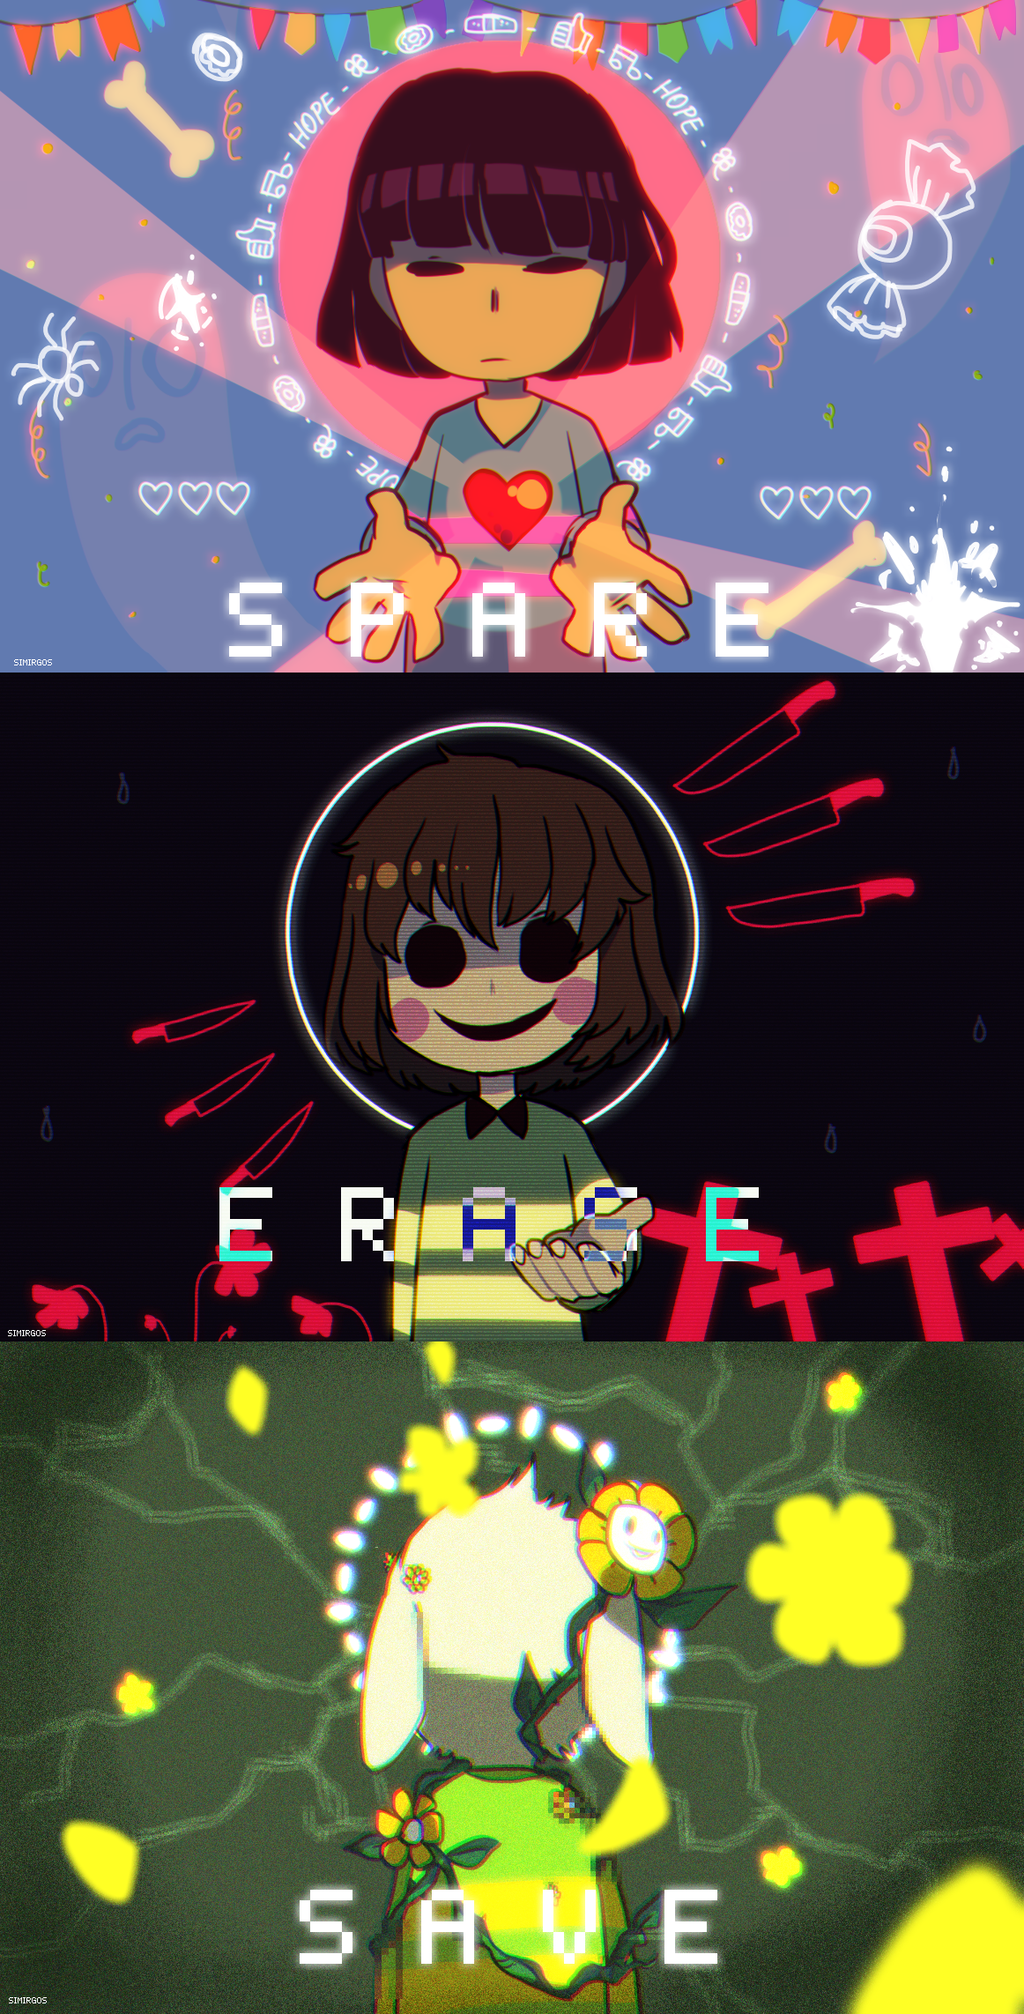 SPARE // ERASE // SAVE by escafandrista on DeviantArt